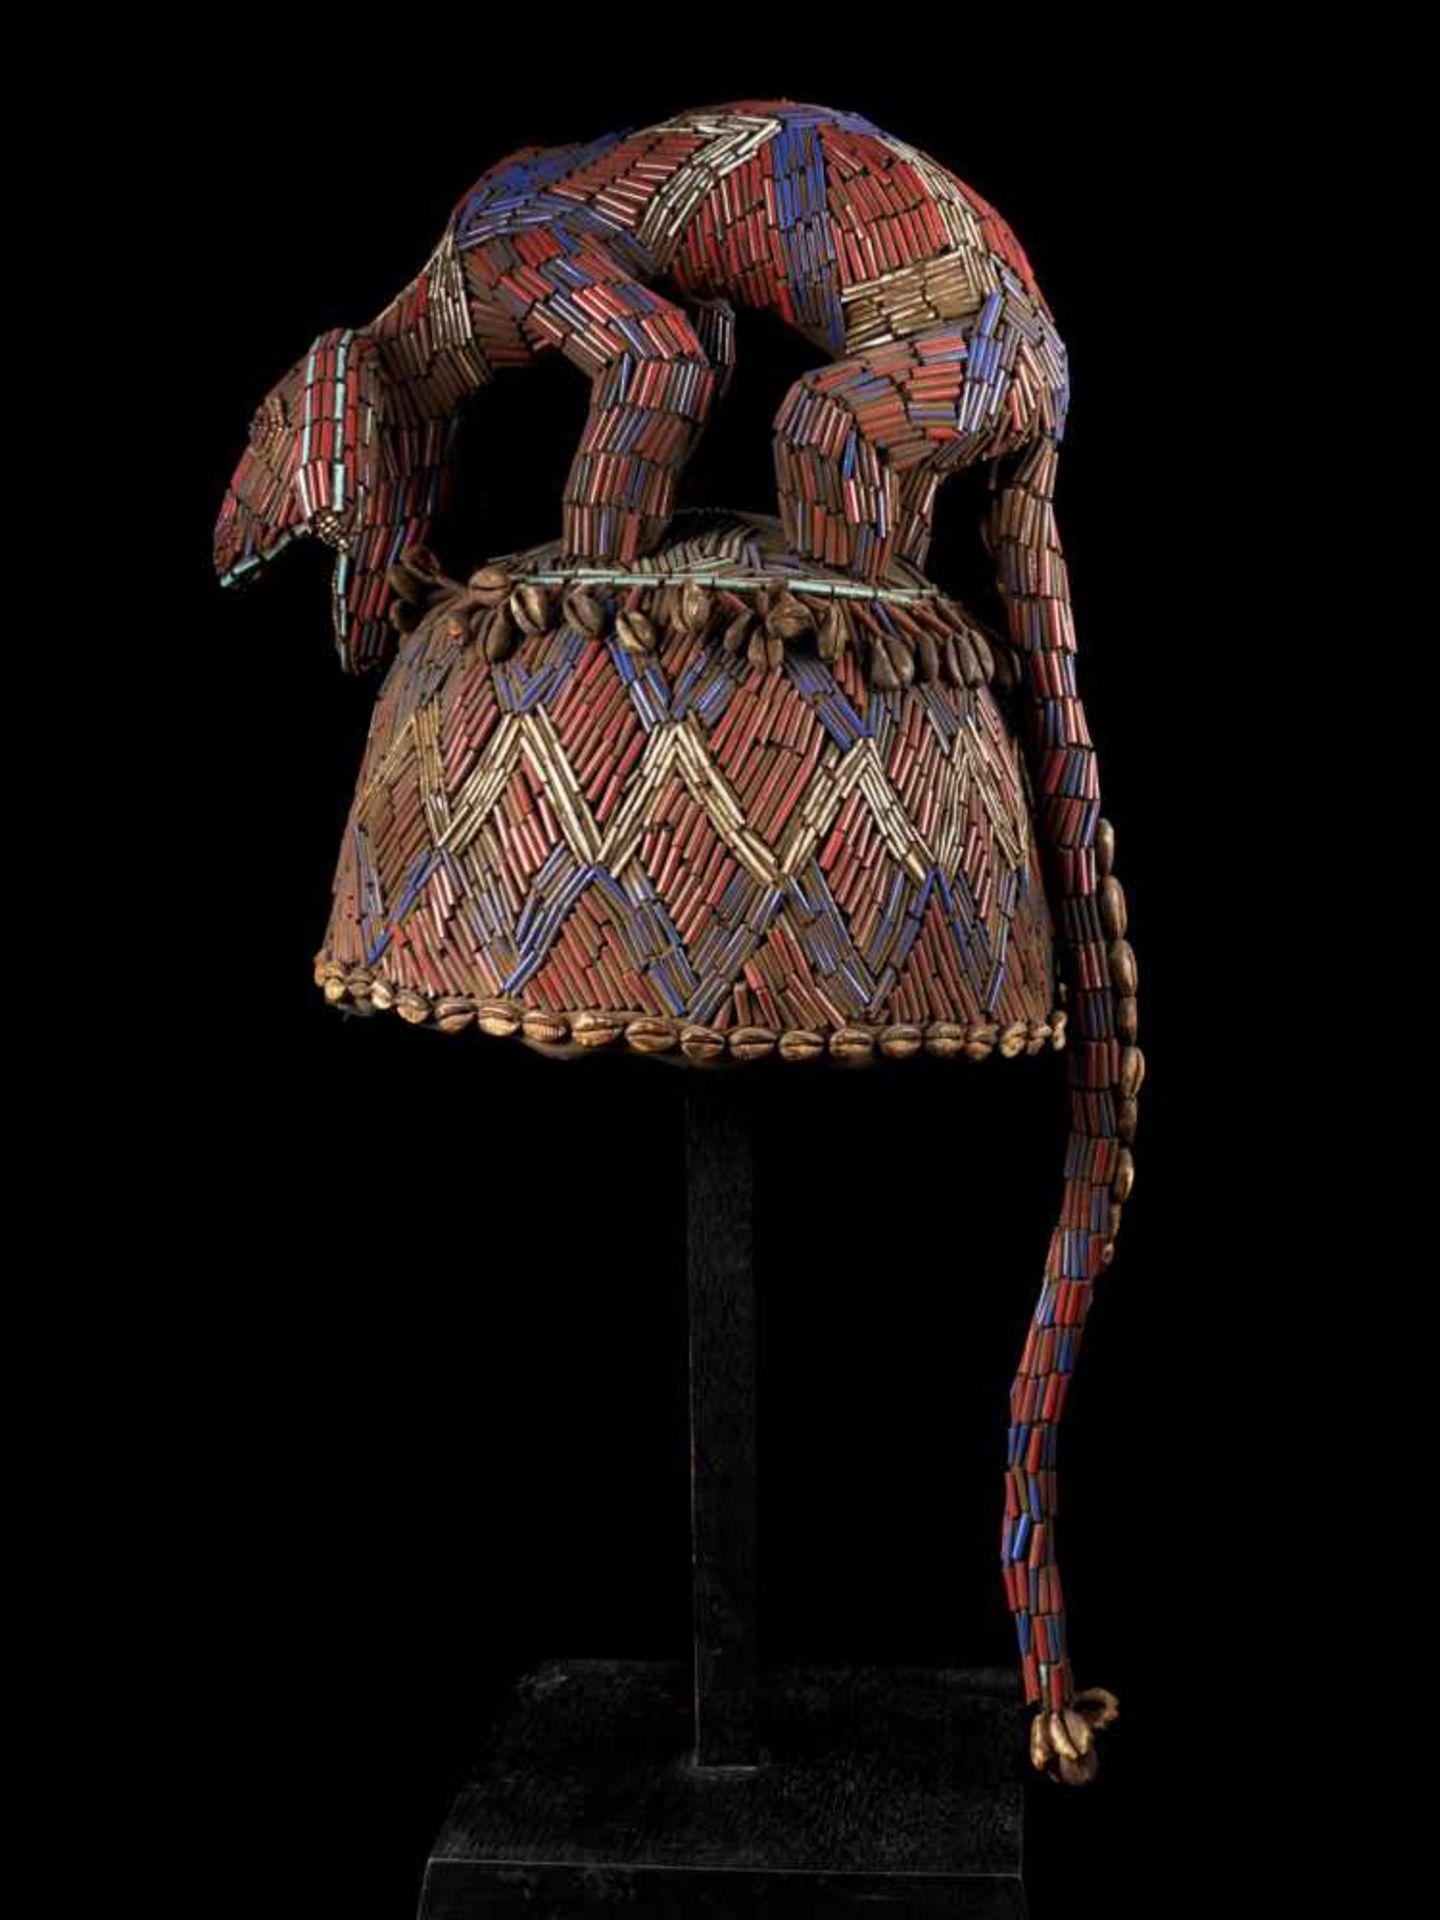 Beaded Blue Headdress With Kauris Finish - Tribal ArtThis impressive headdress is delightfully - Bild 3 aus 5